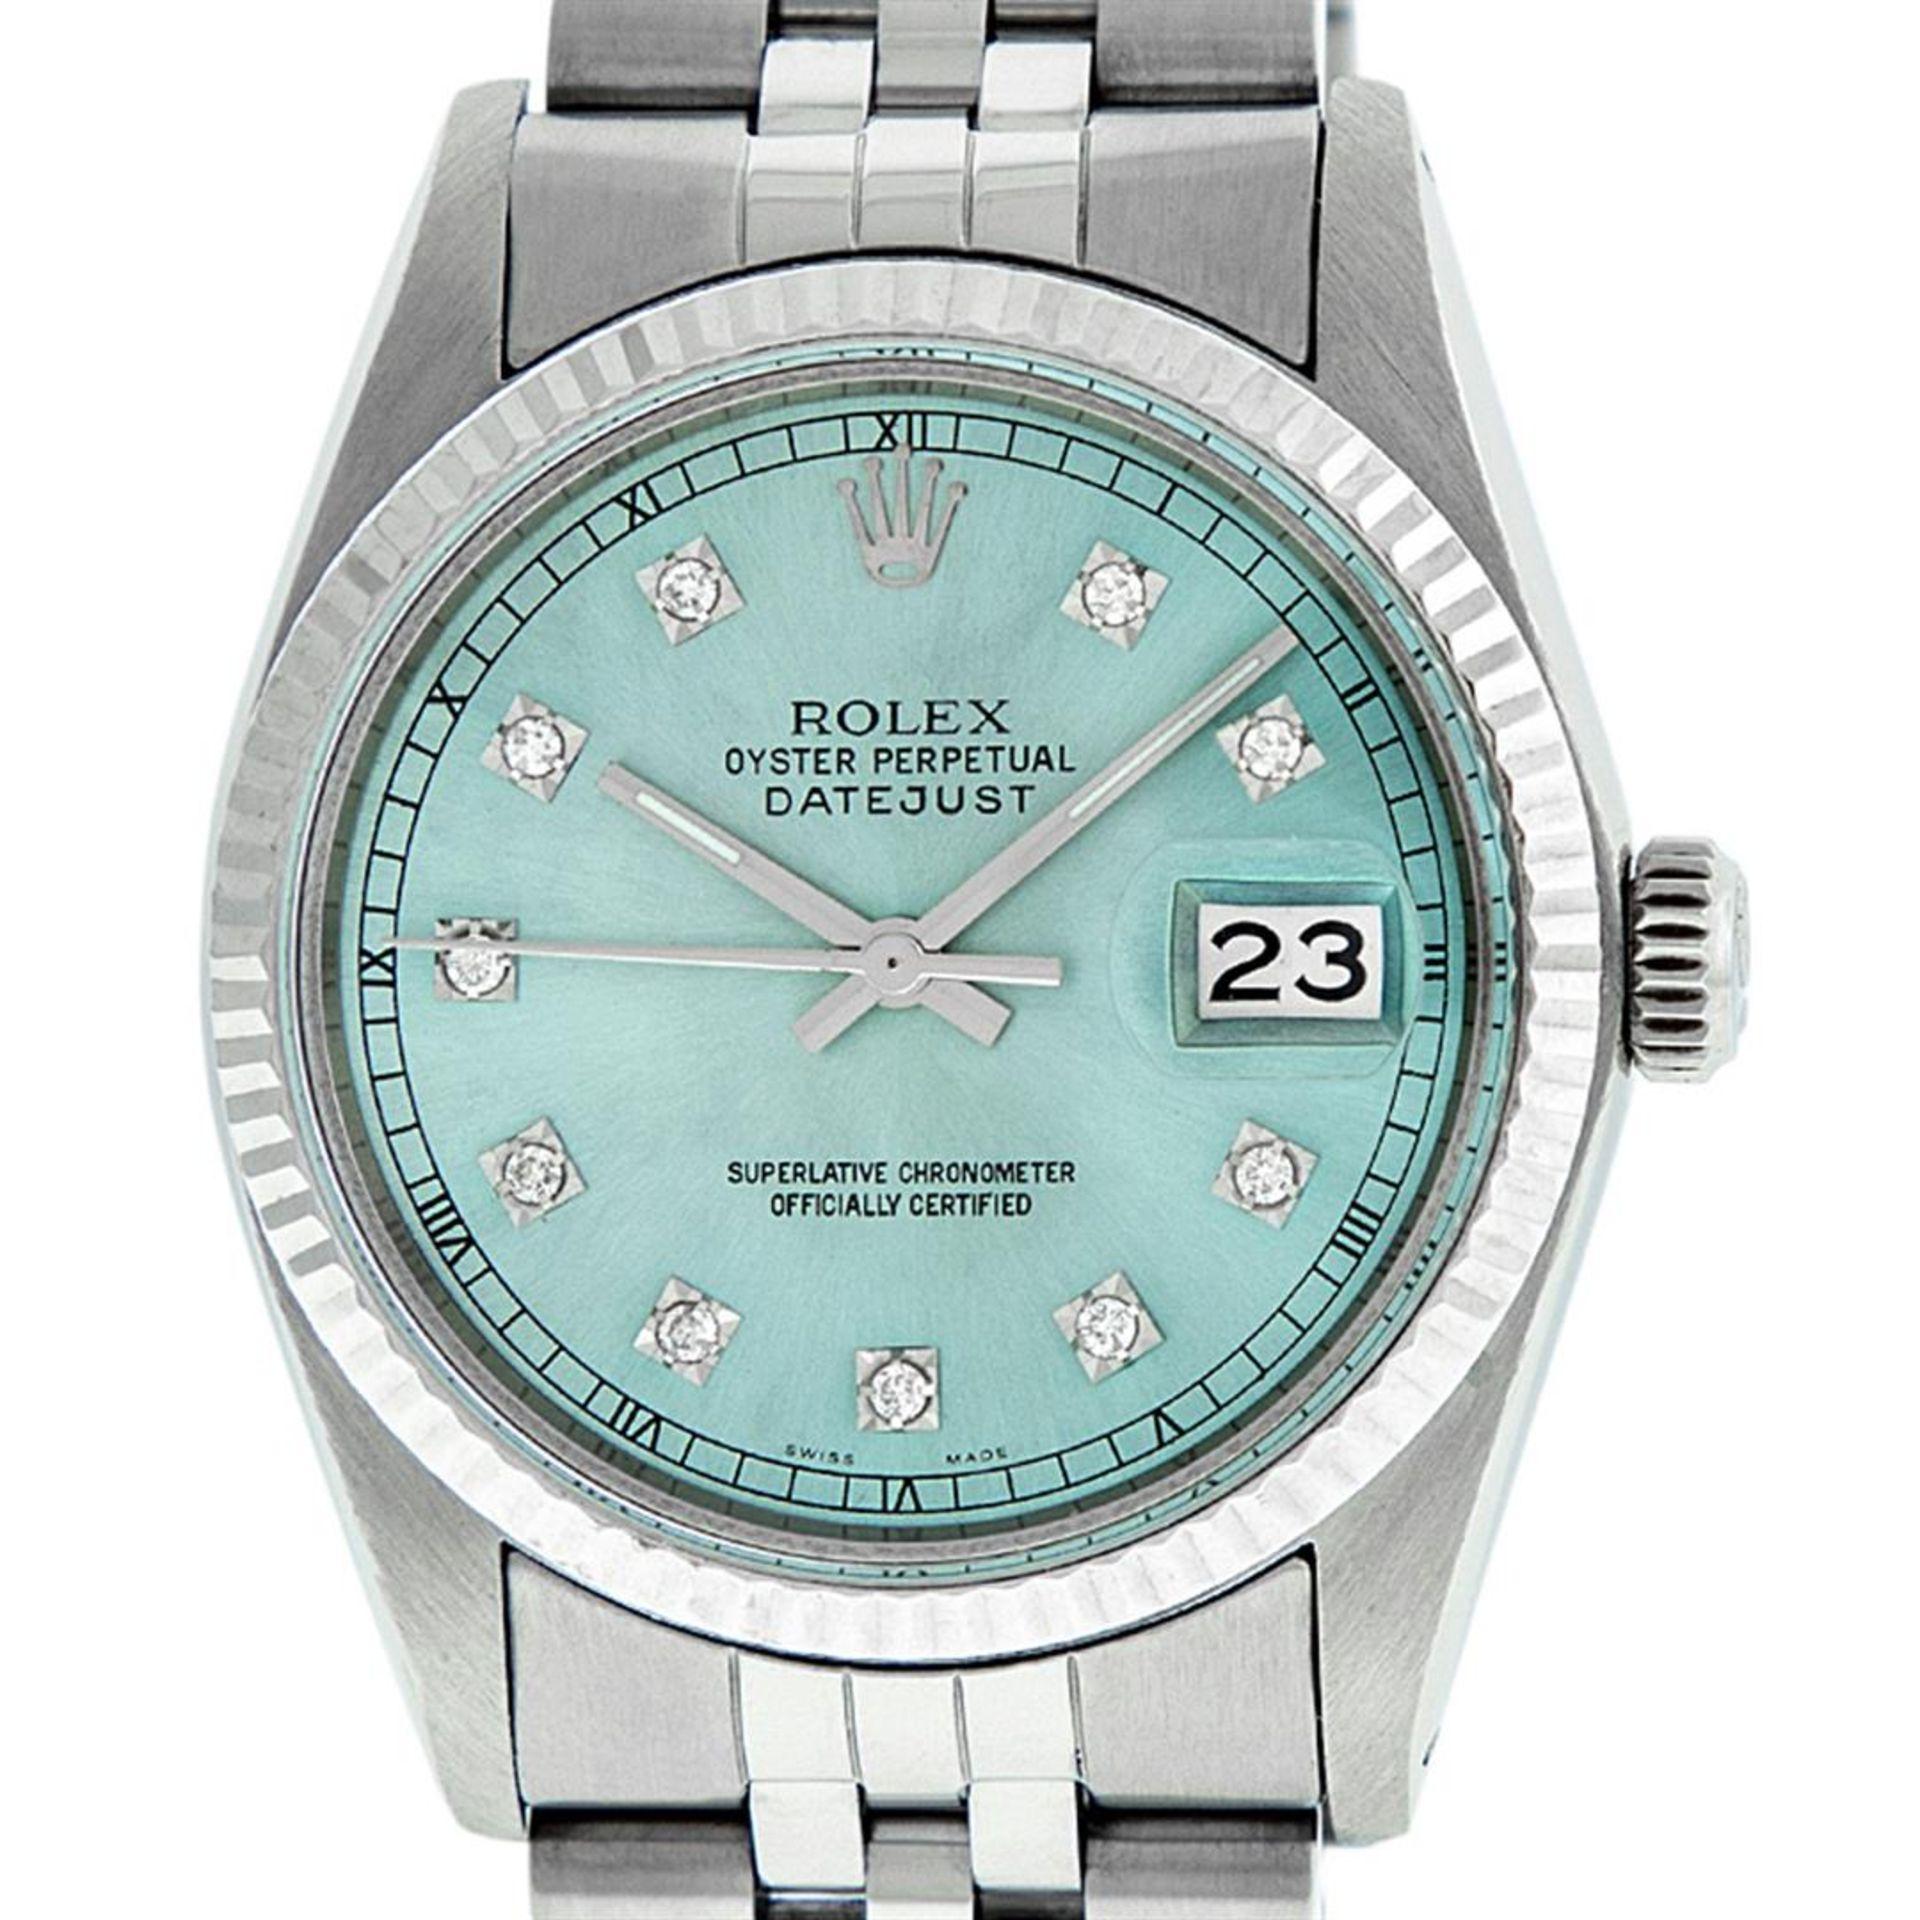 Rolex Mens Stainless Steel Ice Blue Diamond Datejust Wristwatch - Image 2 of 9